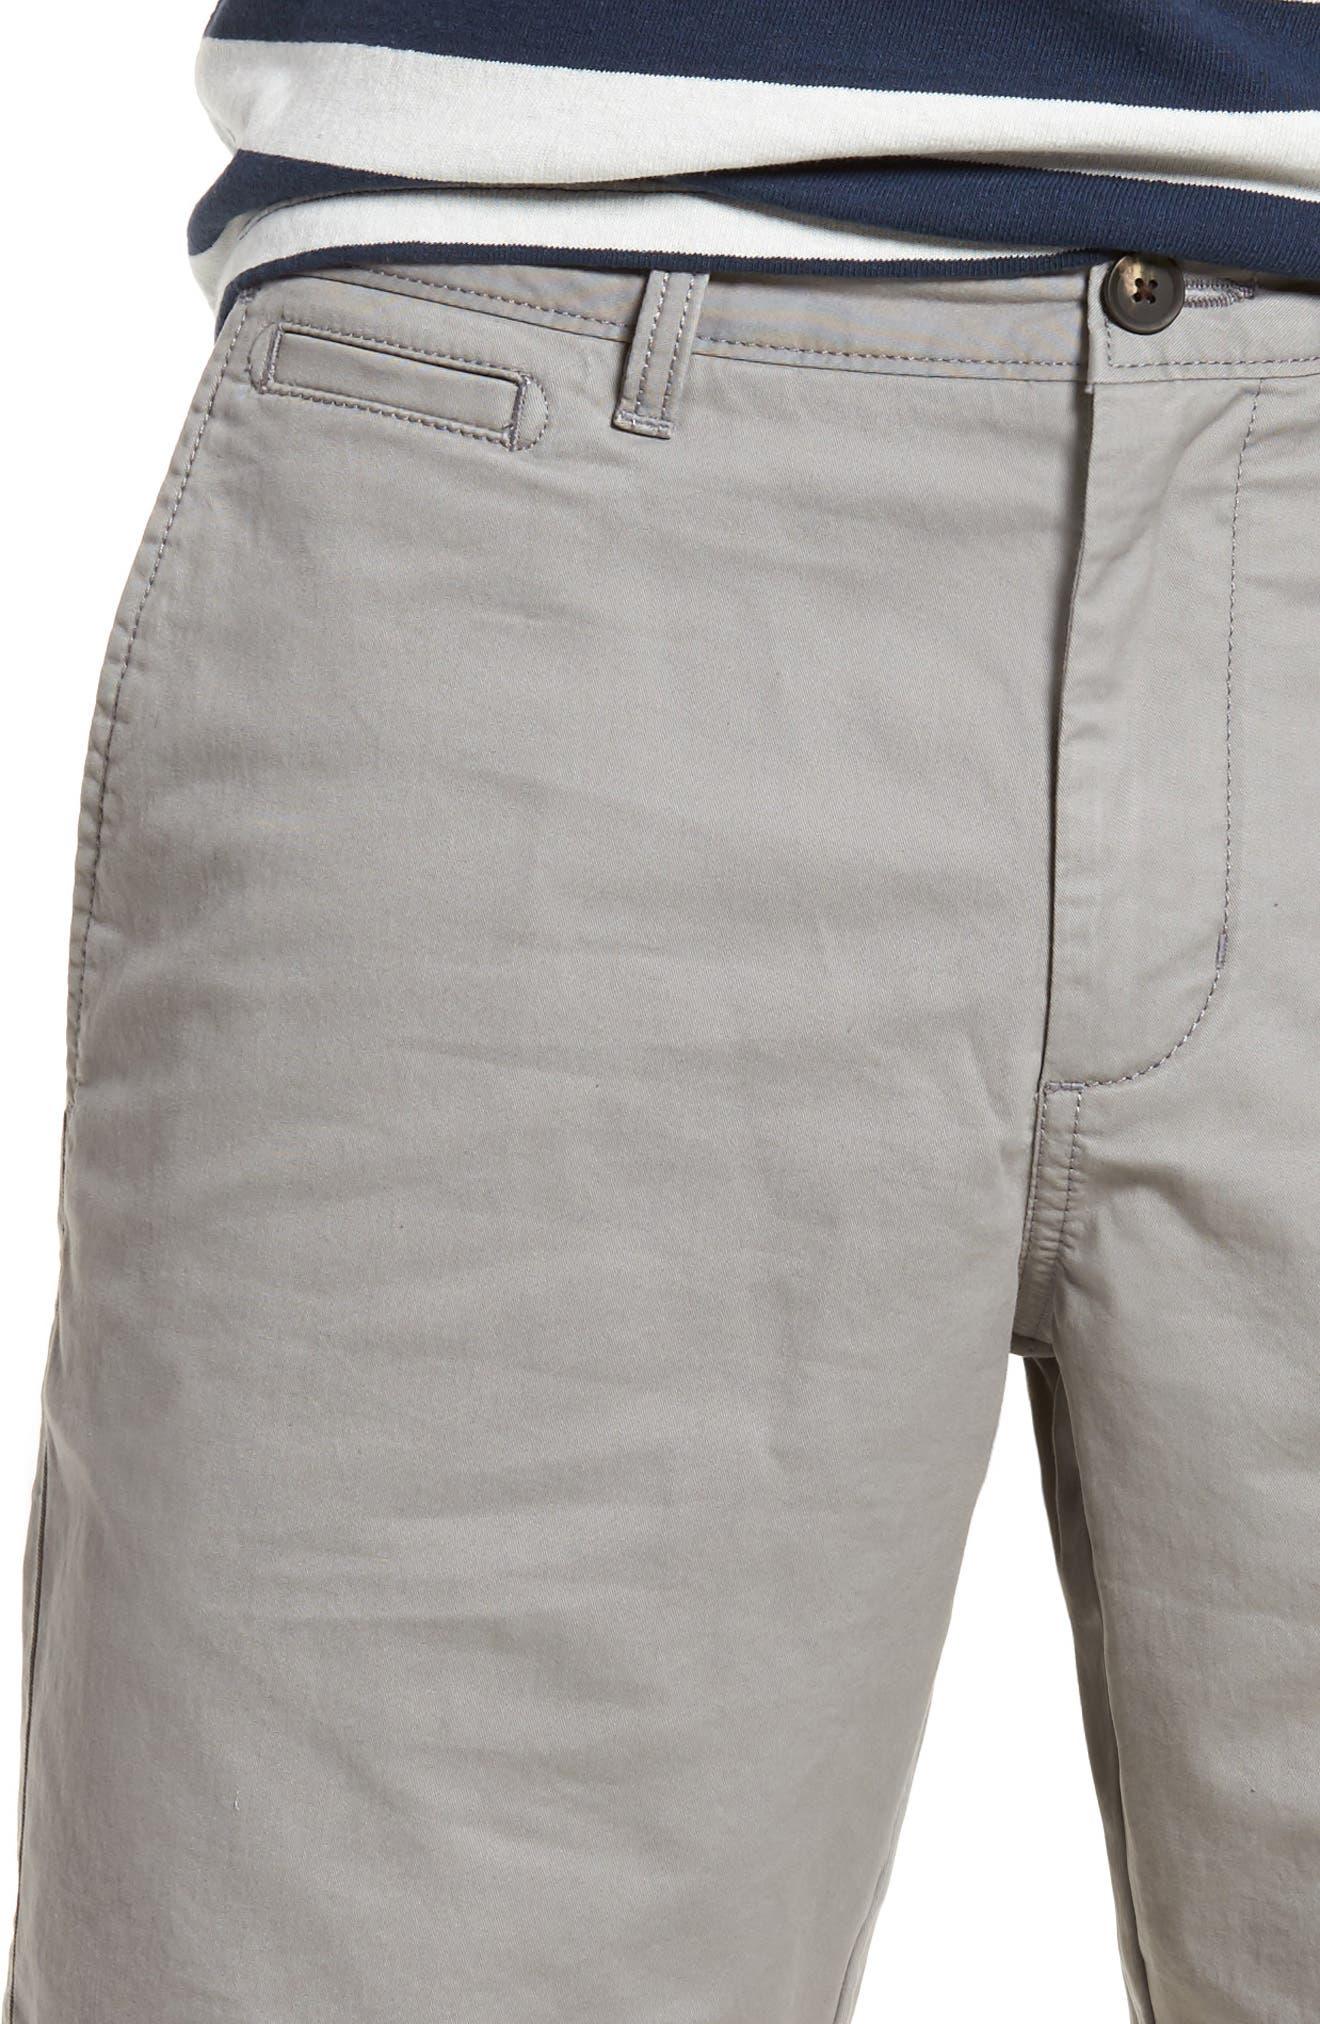 Ballard Slim Fit Stretch Chino 9-Inch Shorts,                             Alternate thumbnail 4, color,                             030